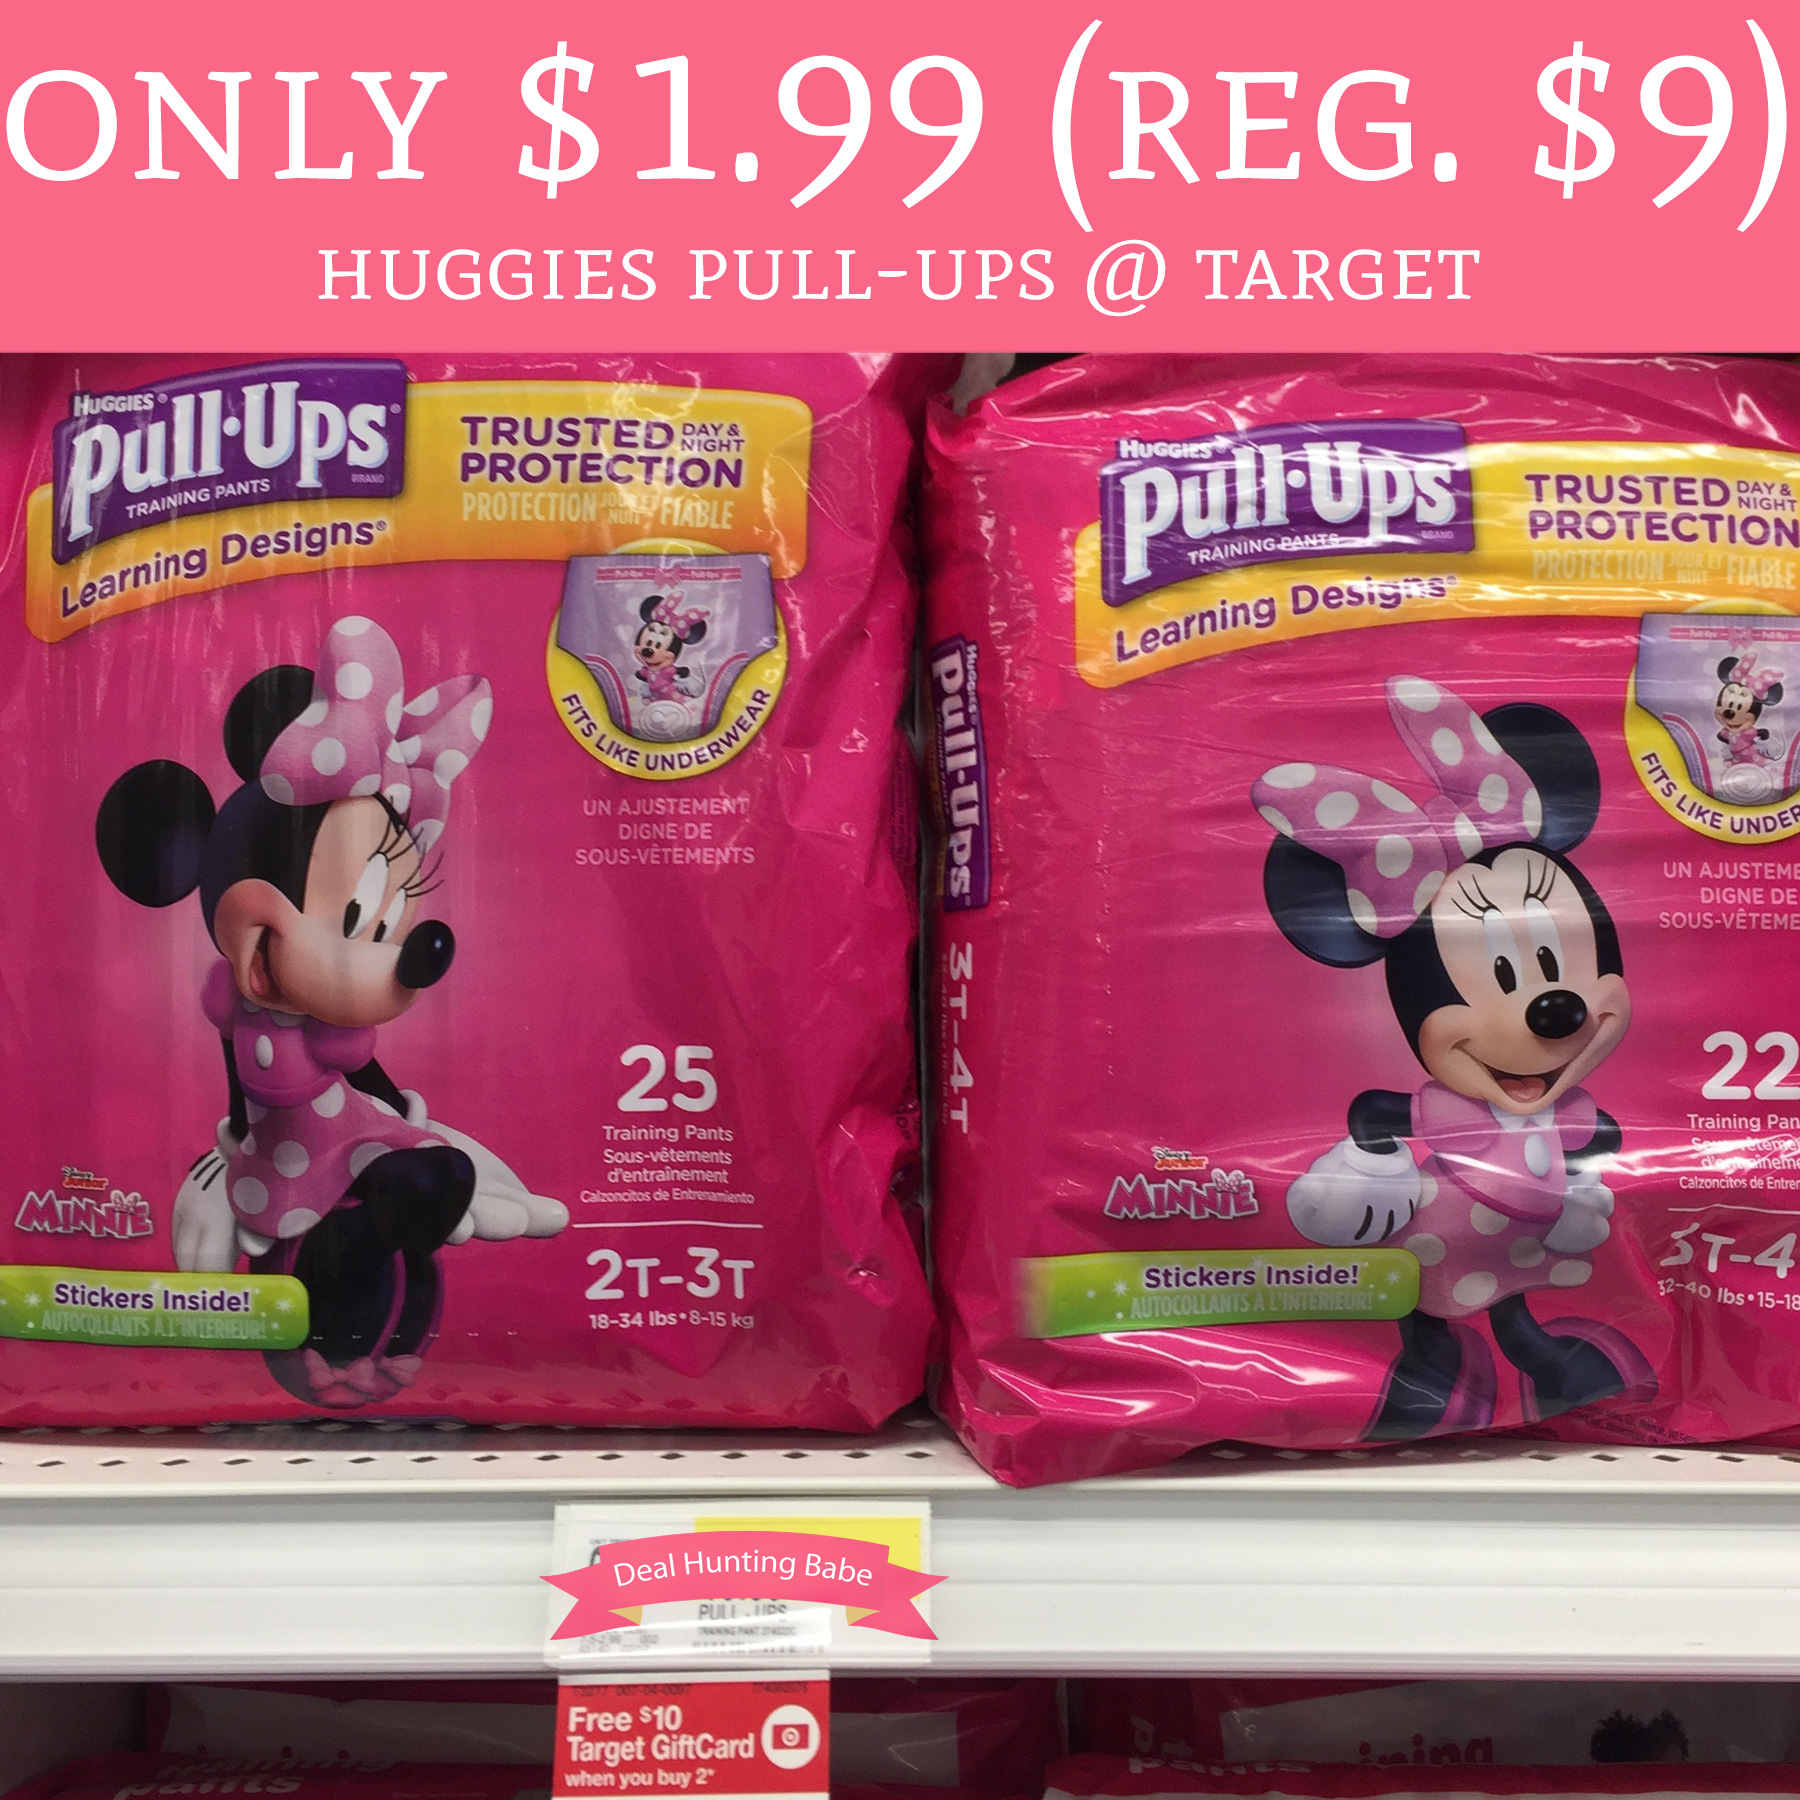 PRINT! Only $1 99 (Regular $9) Huggies Pull-Ups @ Target